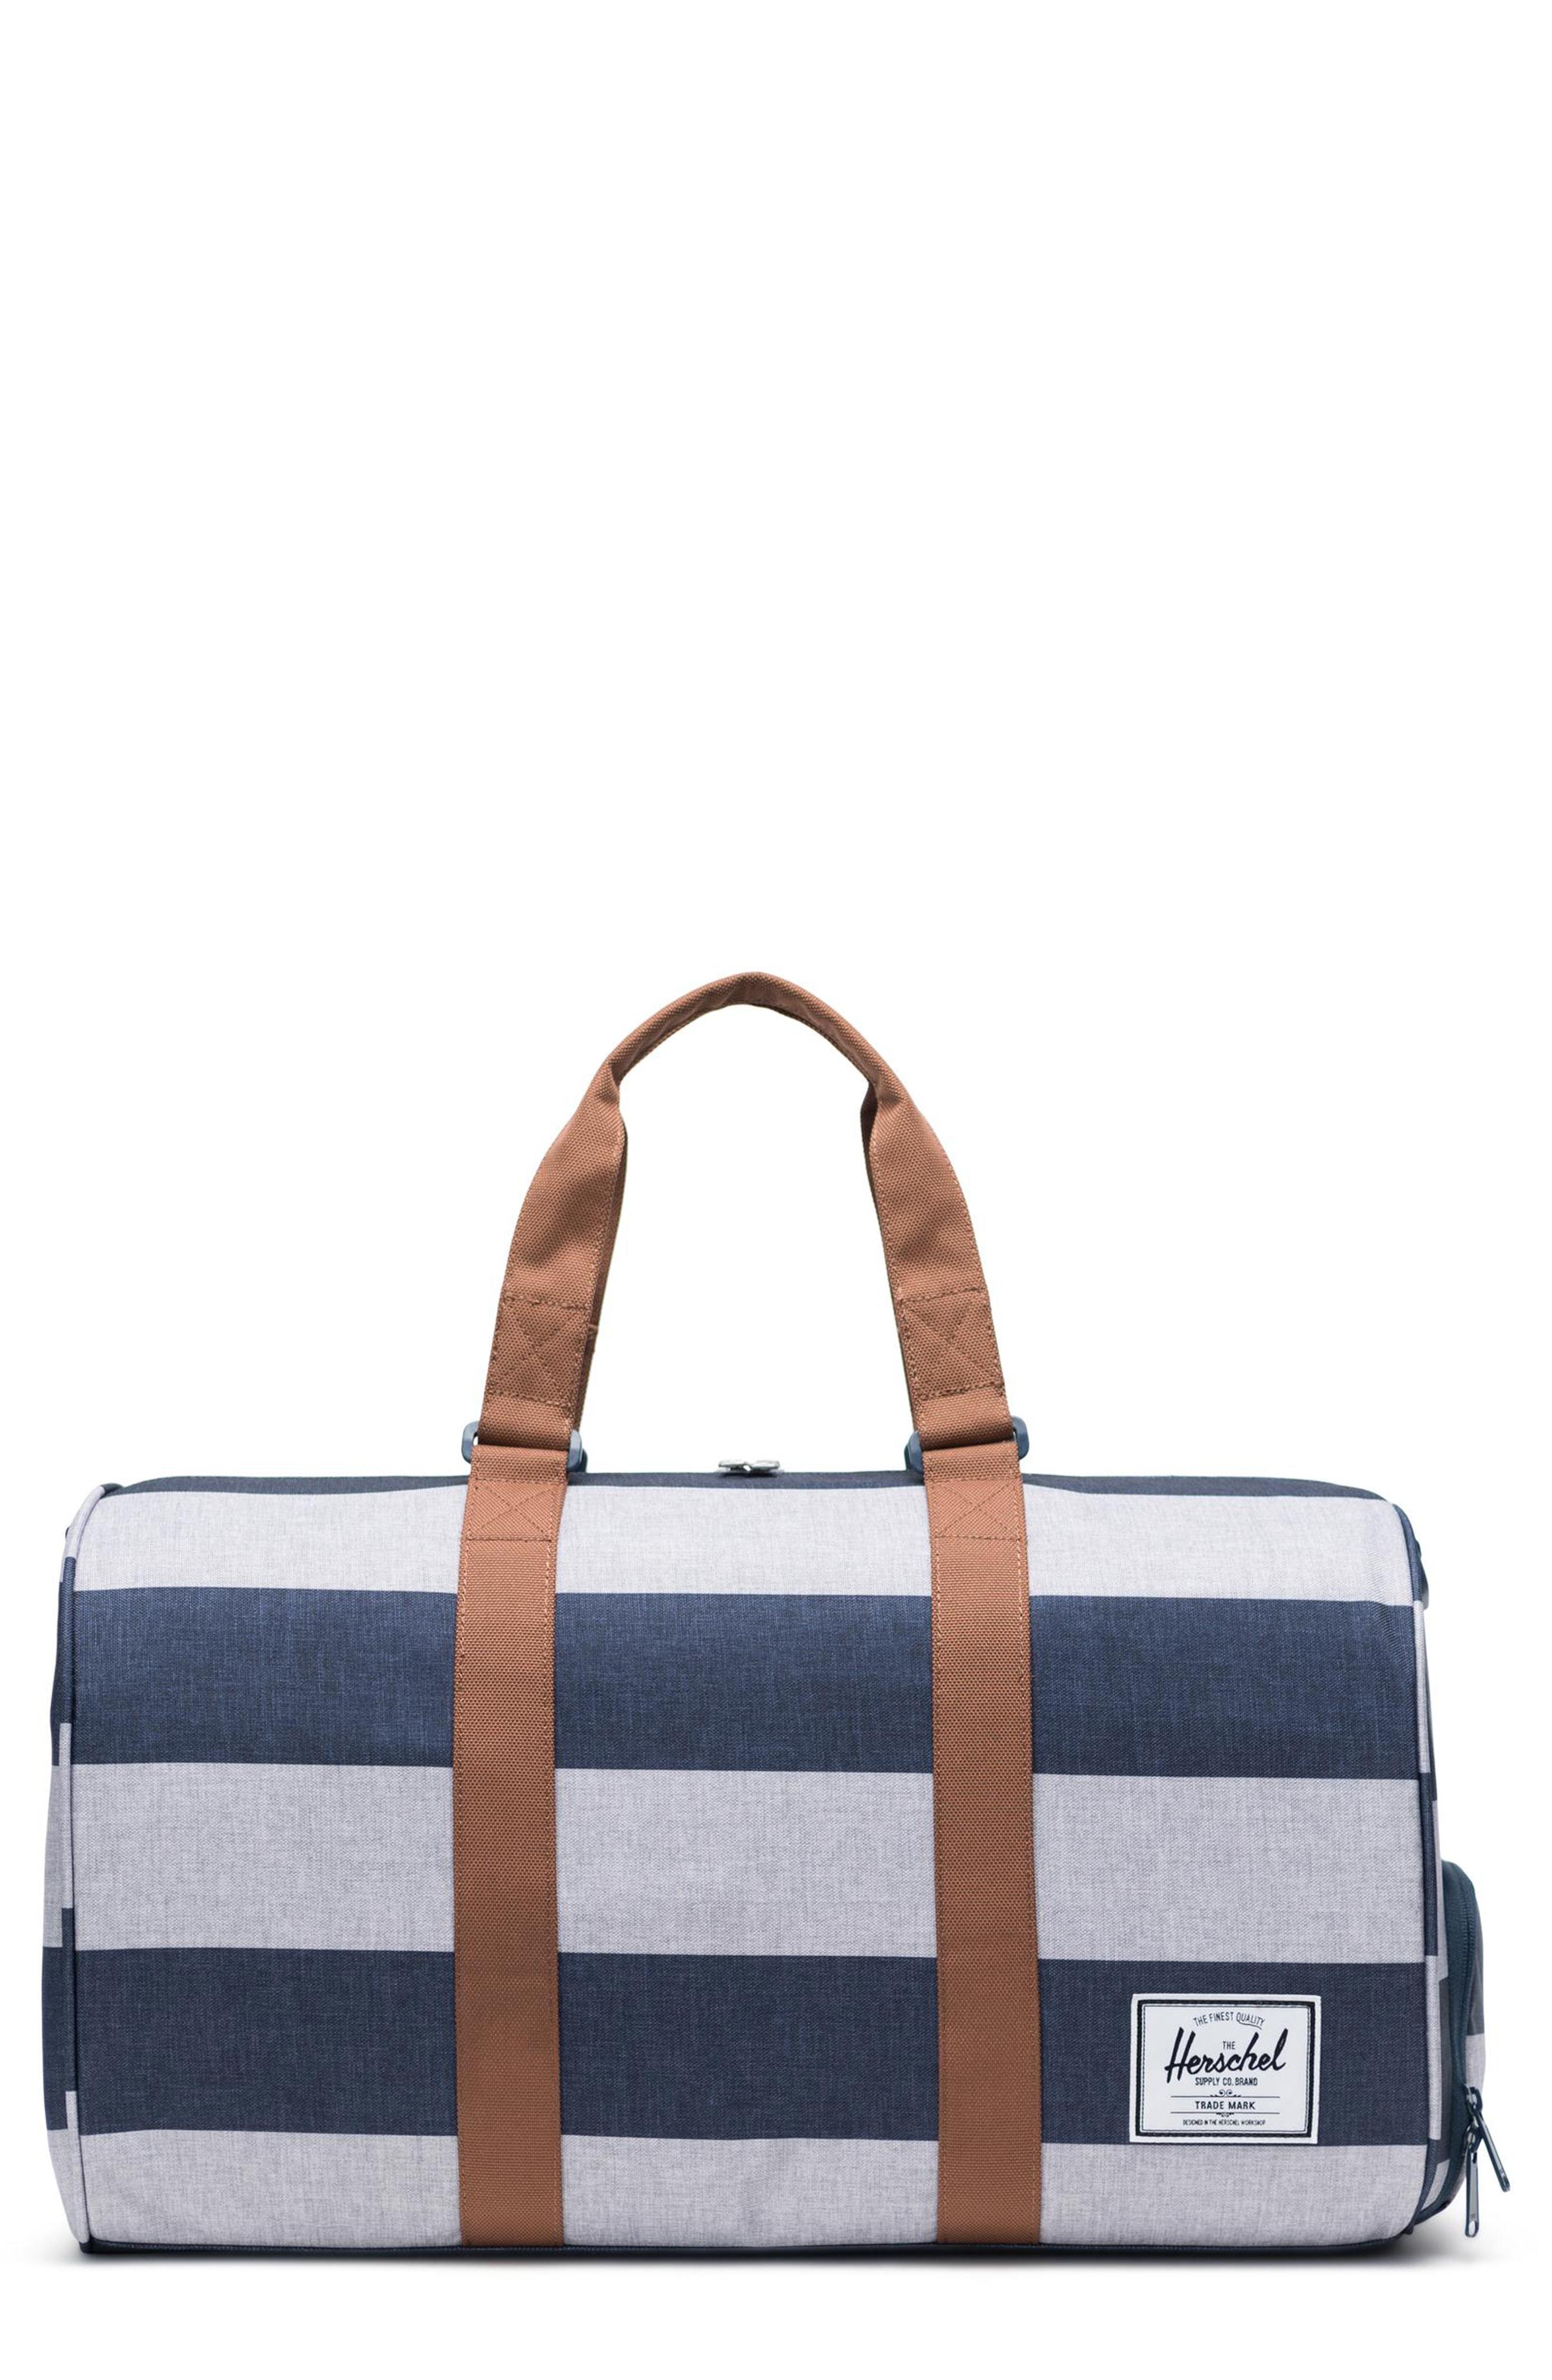 3e3fd808e2765 Herschel Supply Co. Novel Duffel Bag - Blue In Border Stripe  Saddle Brown